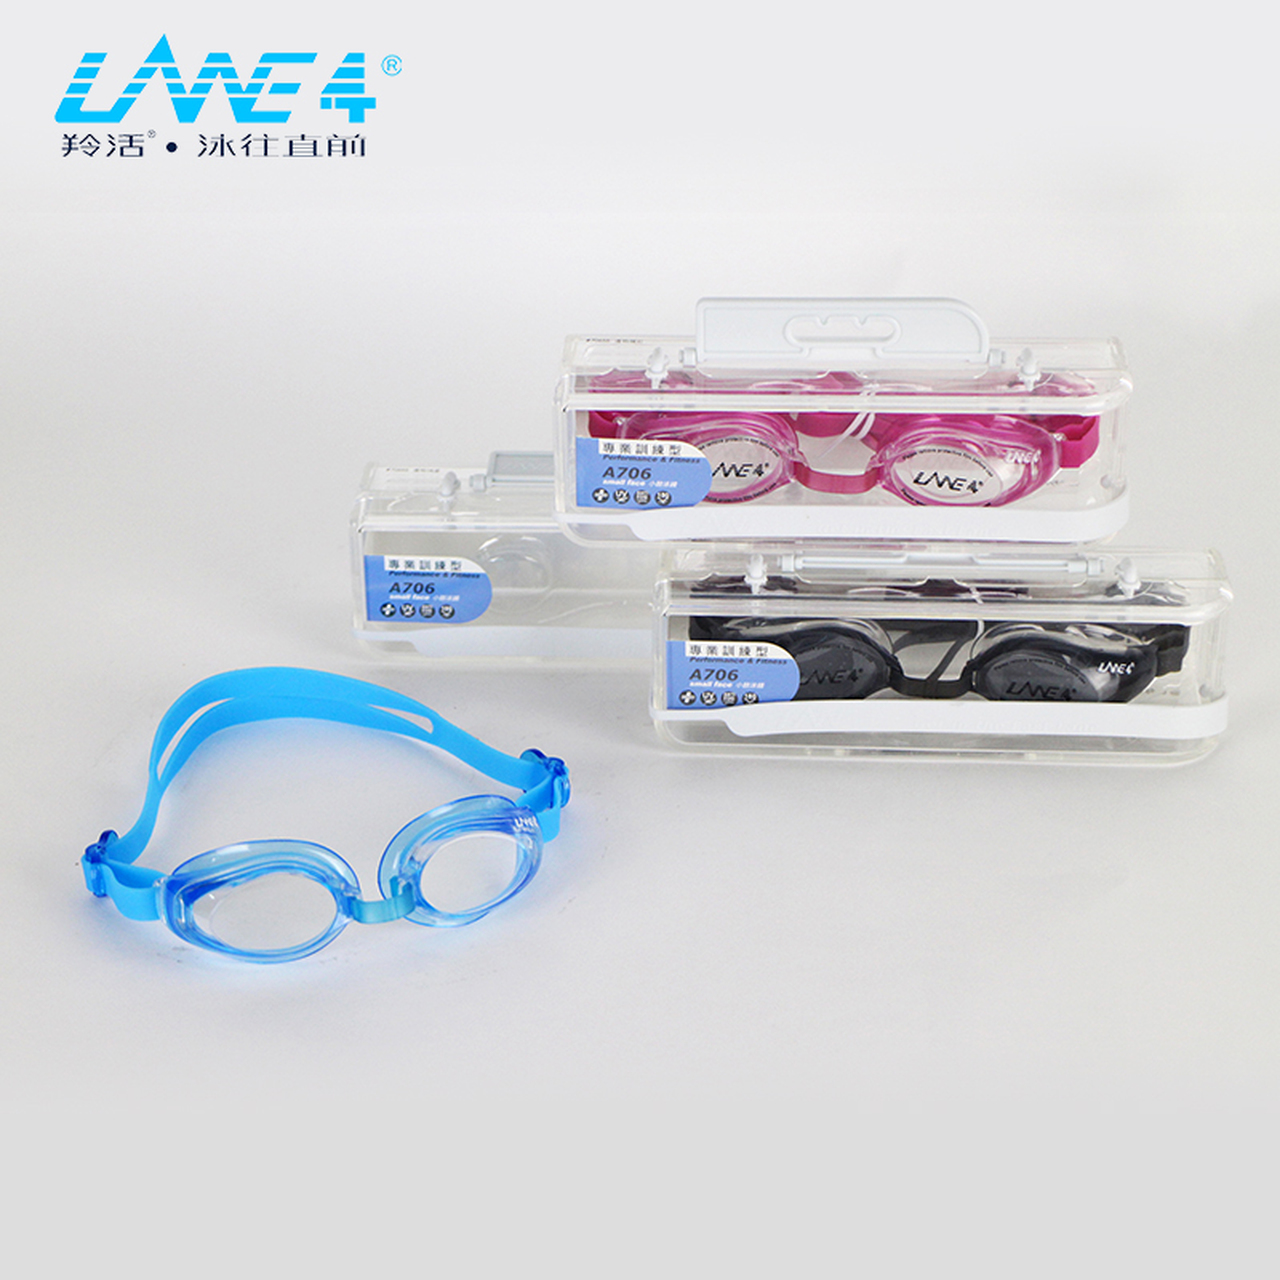 ae8e52b44f2 LANE4 Training   Performance Swim Goggle - Hydrodynamic Design Prescription  Anti-fog UV Protection for